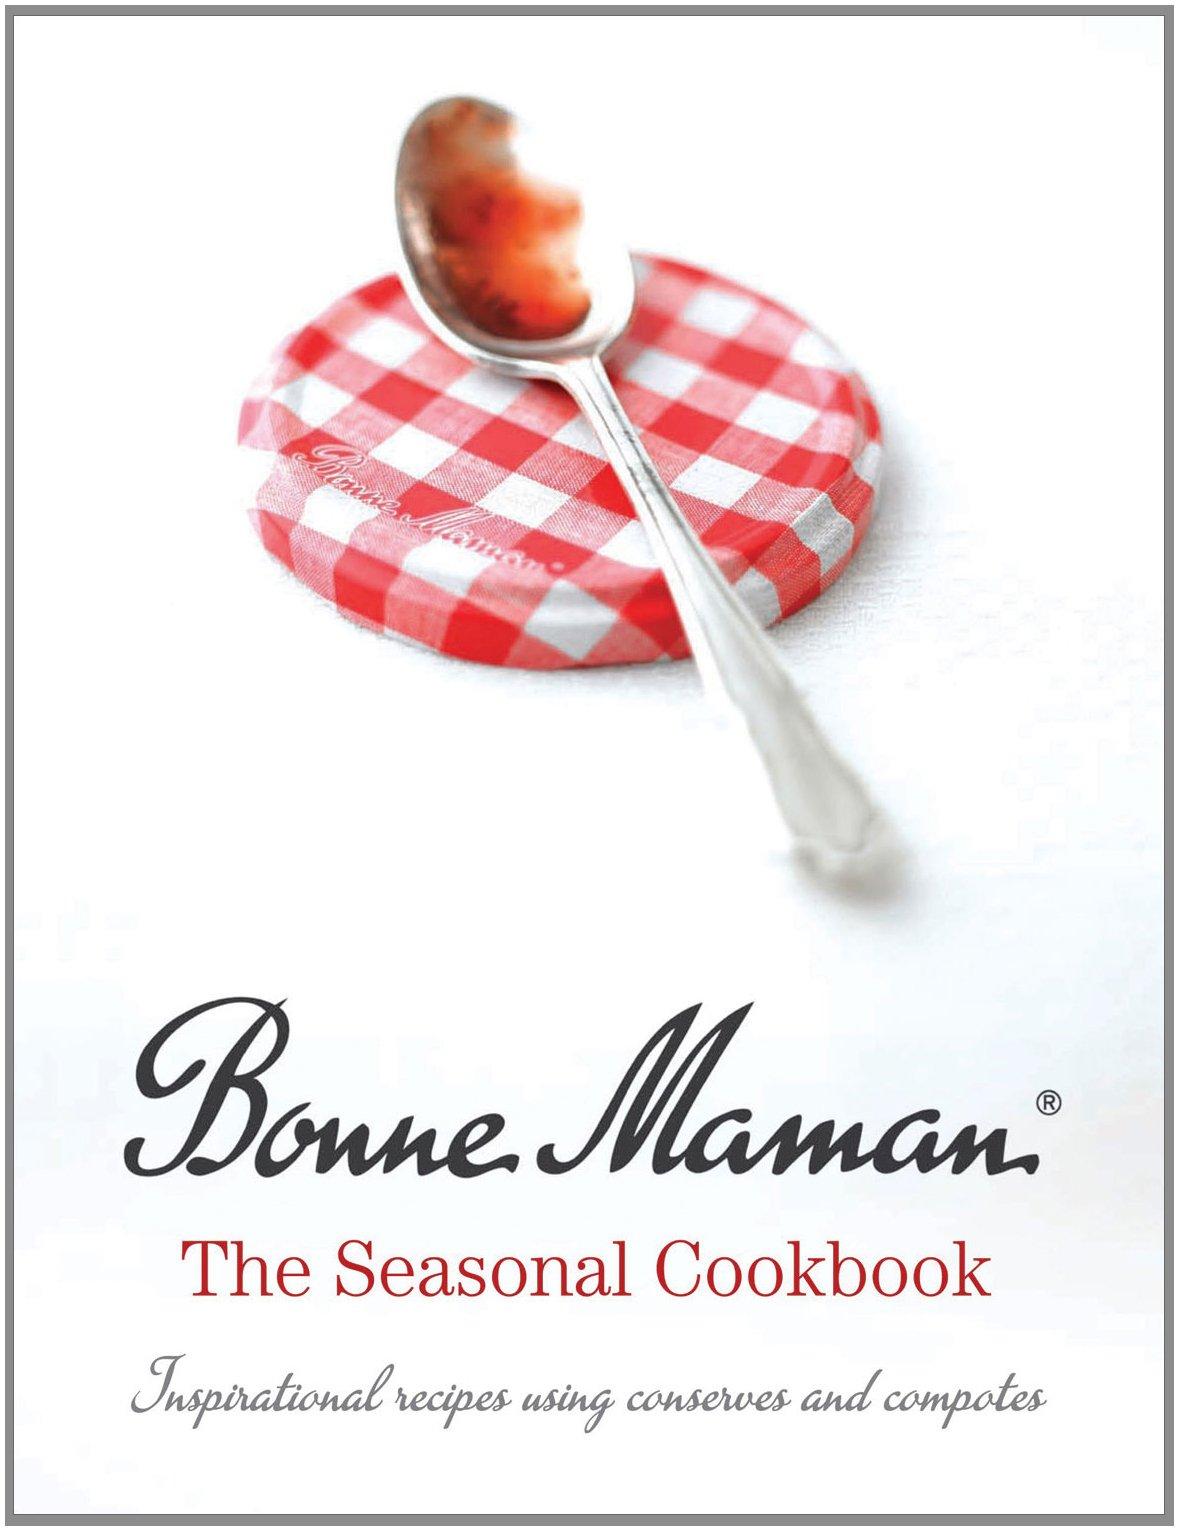 Bonne Mamam seasonal Cookbook